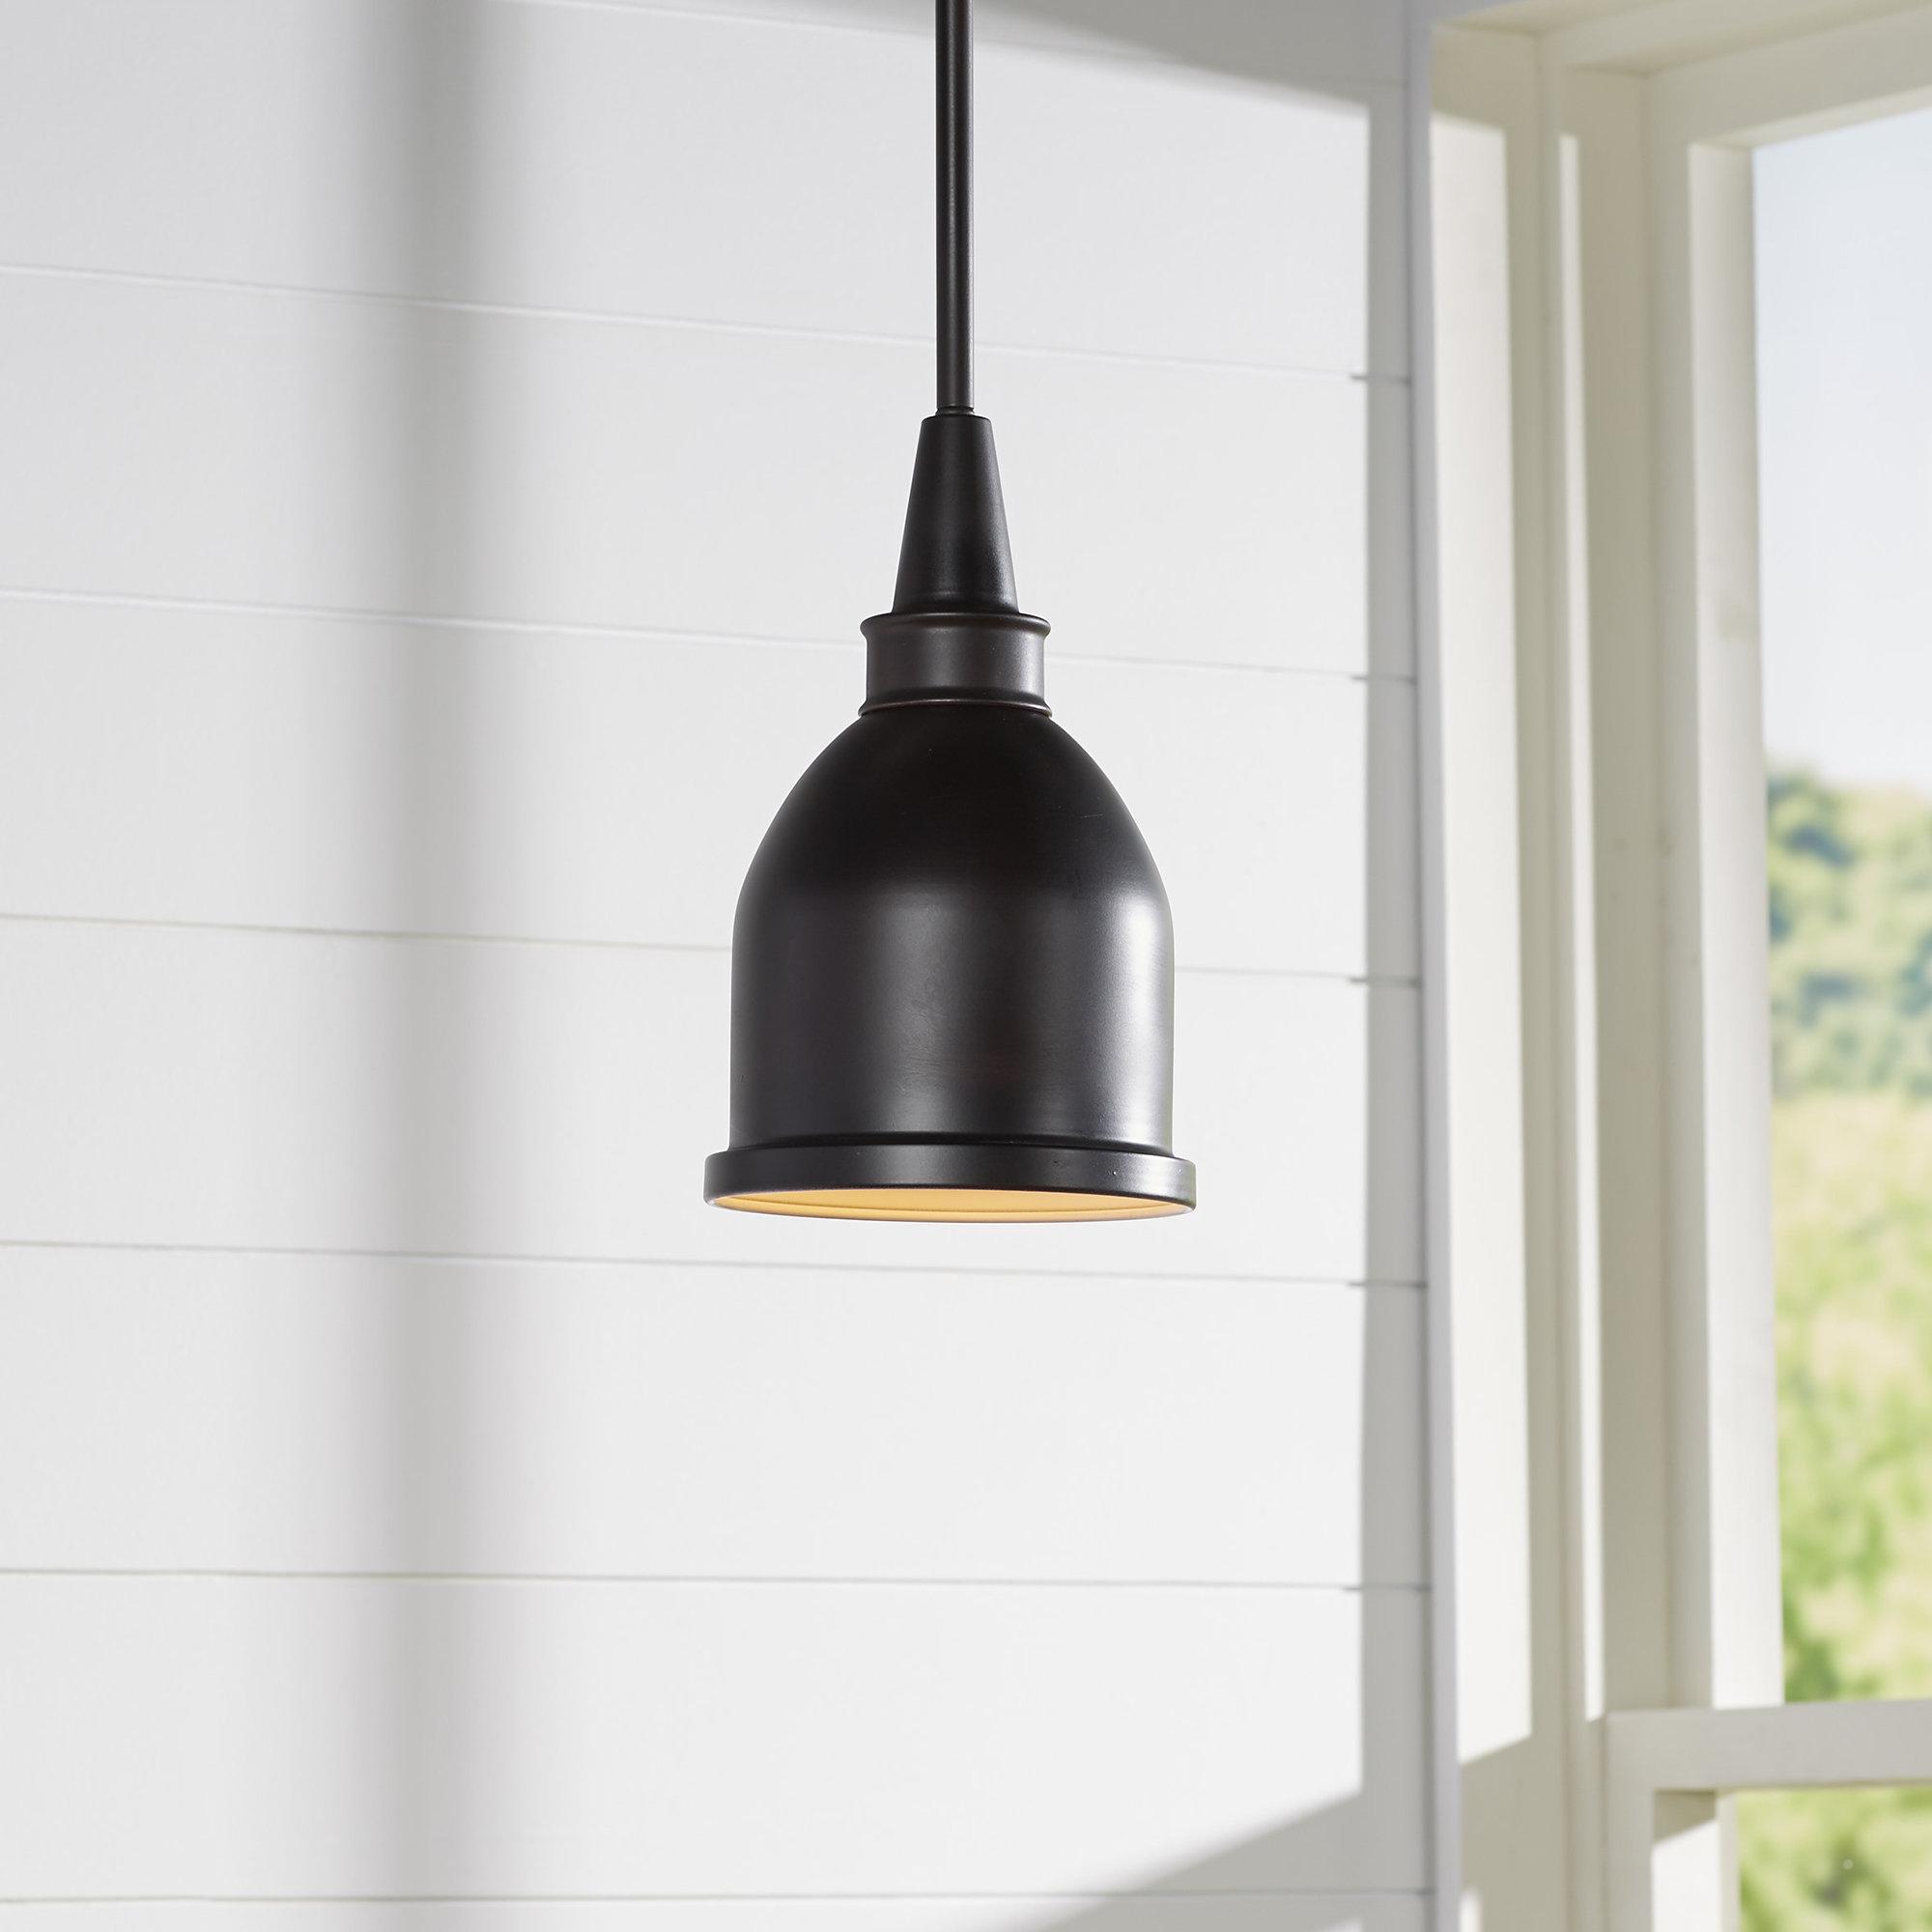 2020 Burslem 3 Light Single Drum Pendants Pertaining To Manston 1 Light Single Bell Pendant (View 1 of 20)